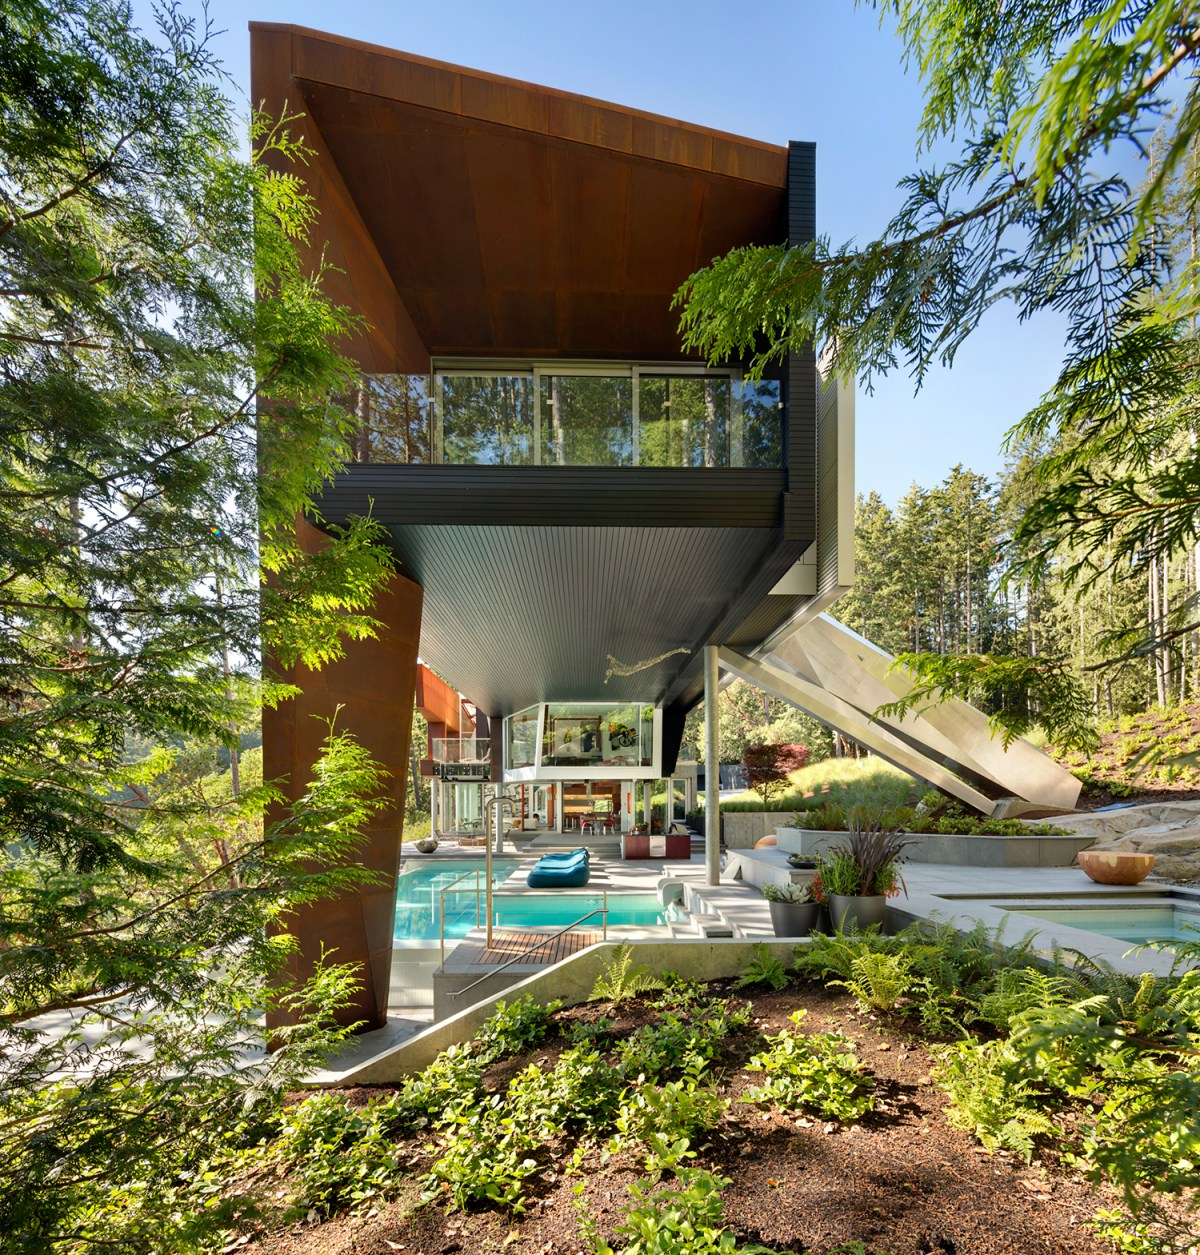 Gulf+Islands+AA+Robins+architecture-2